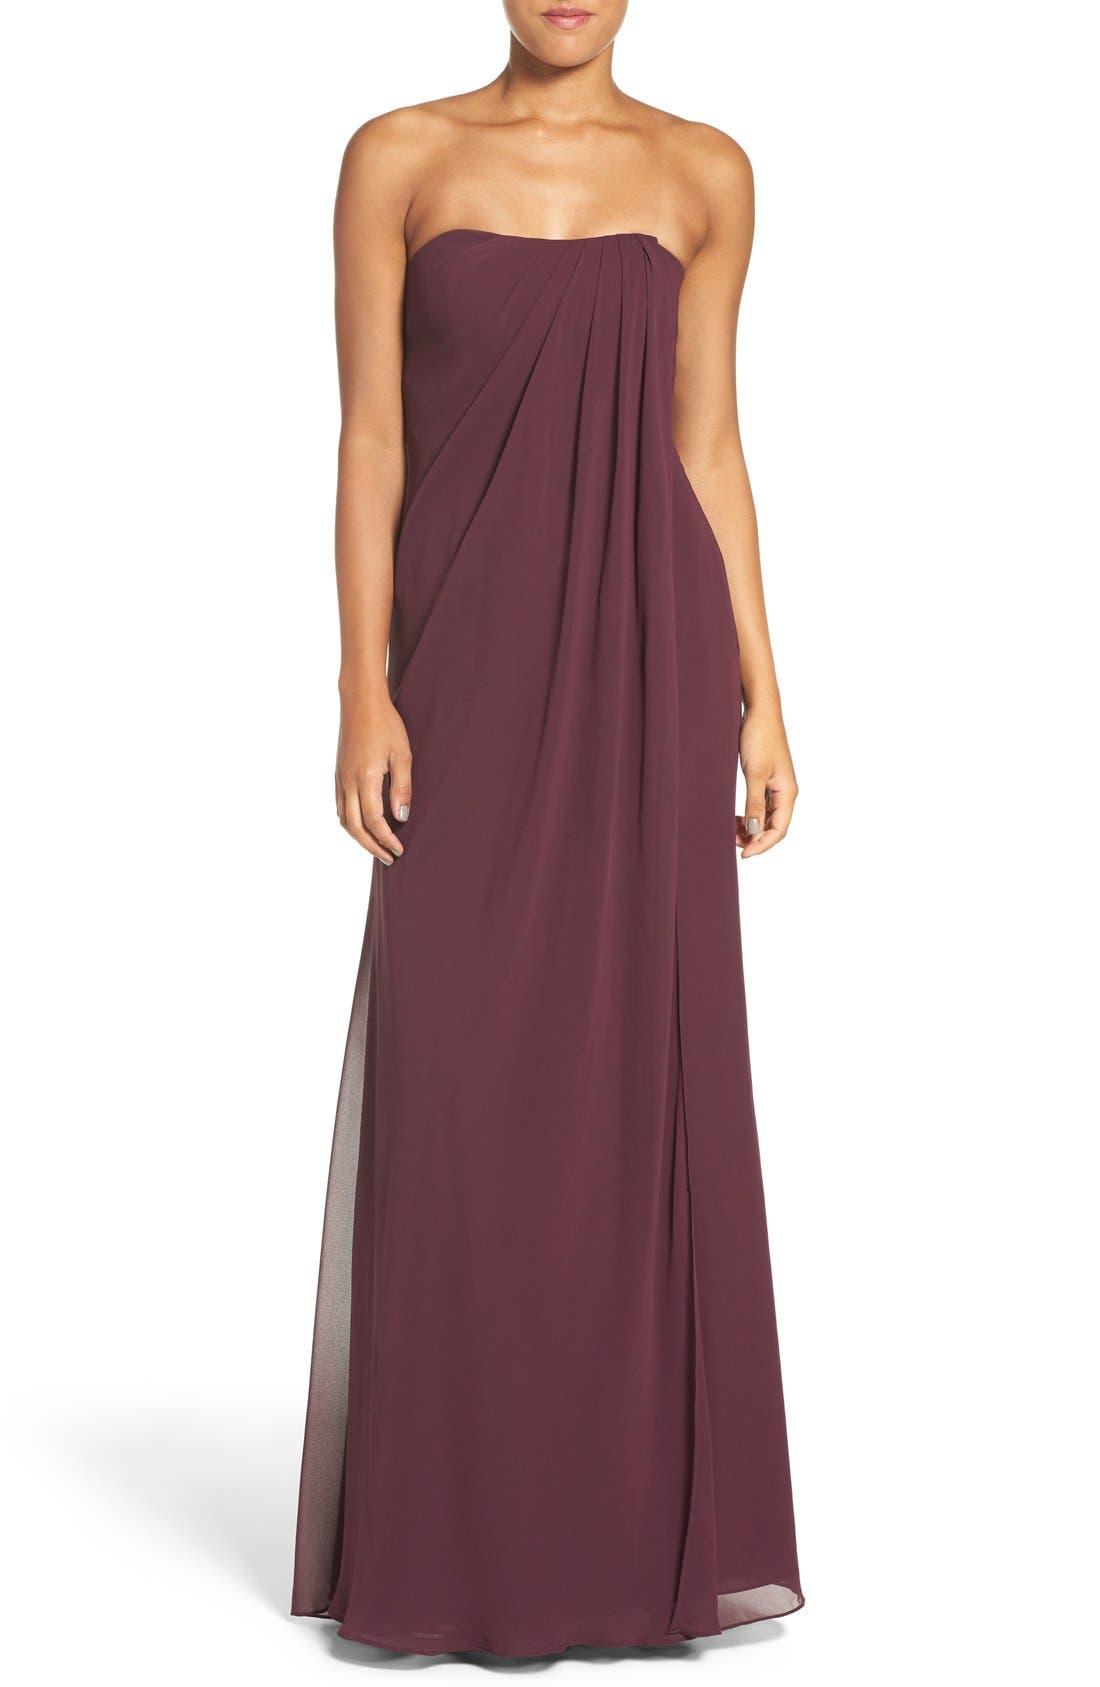 Jenny Yoo 'Raquel' Front Slit Strapless Chiffon Gown